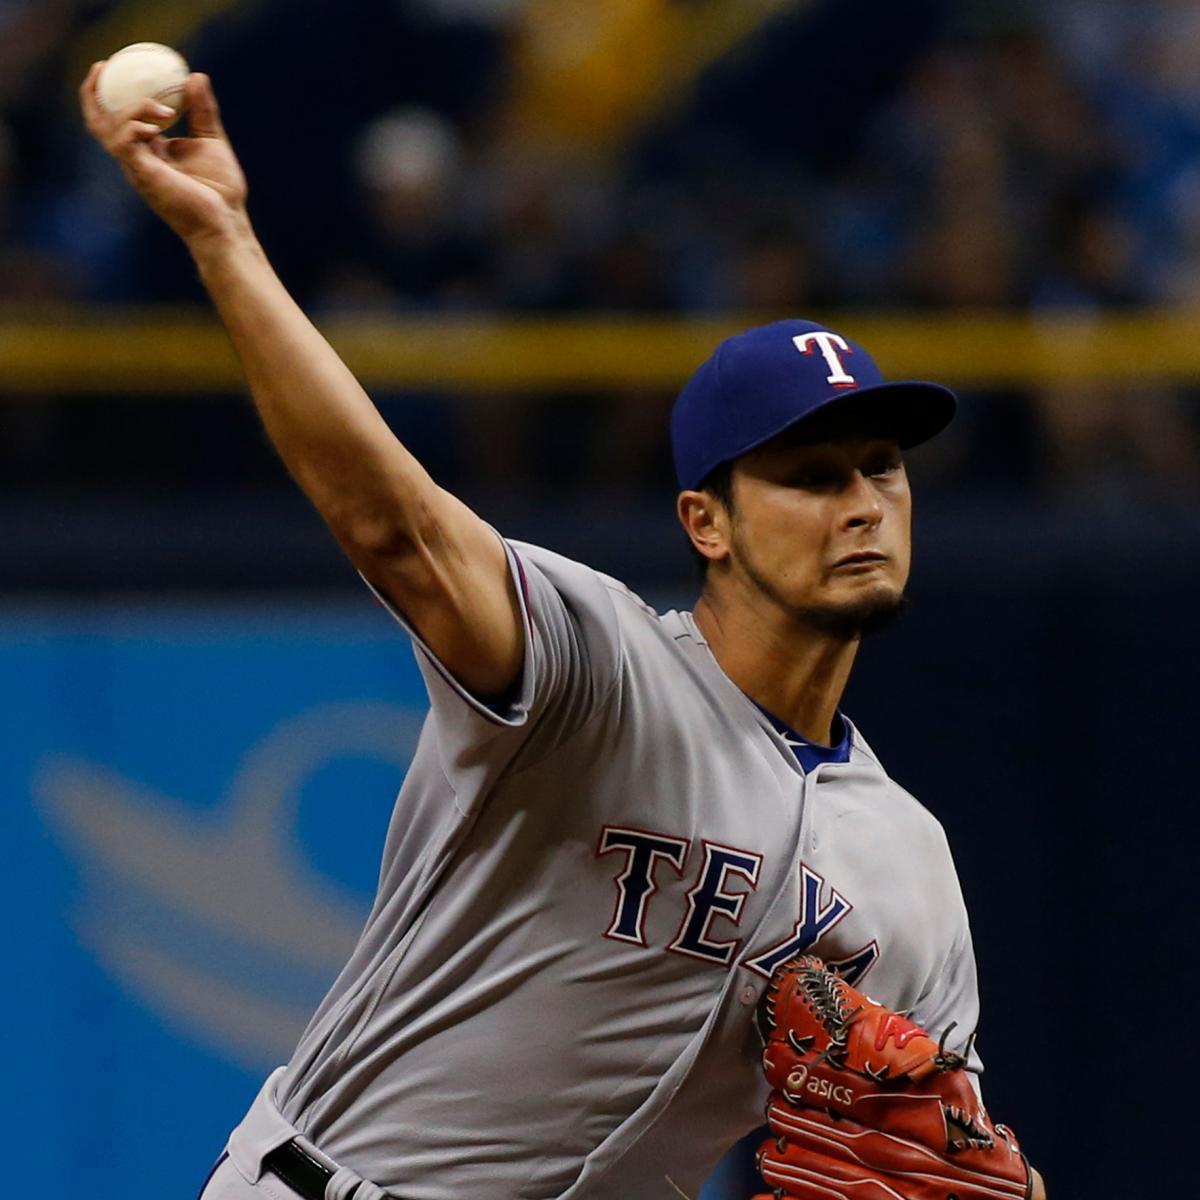 Mlb Rumors Analyzing All The Latest Whispers News And: MLB Trade Rumors: Analyzing Buzz On Yu Darvish, Sonny Gray